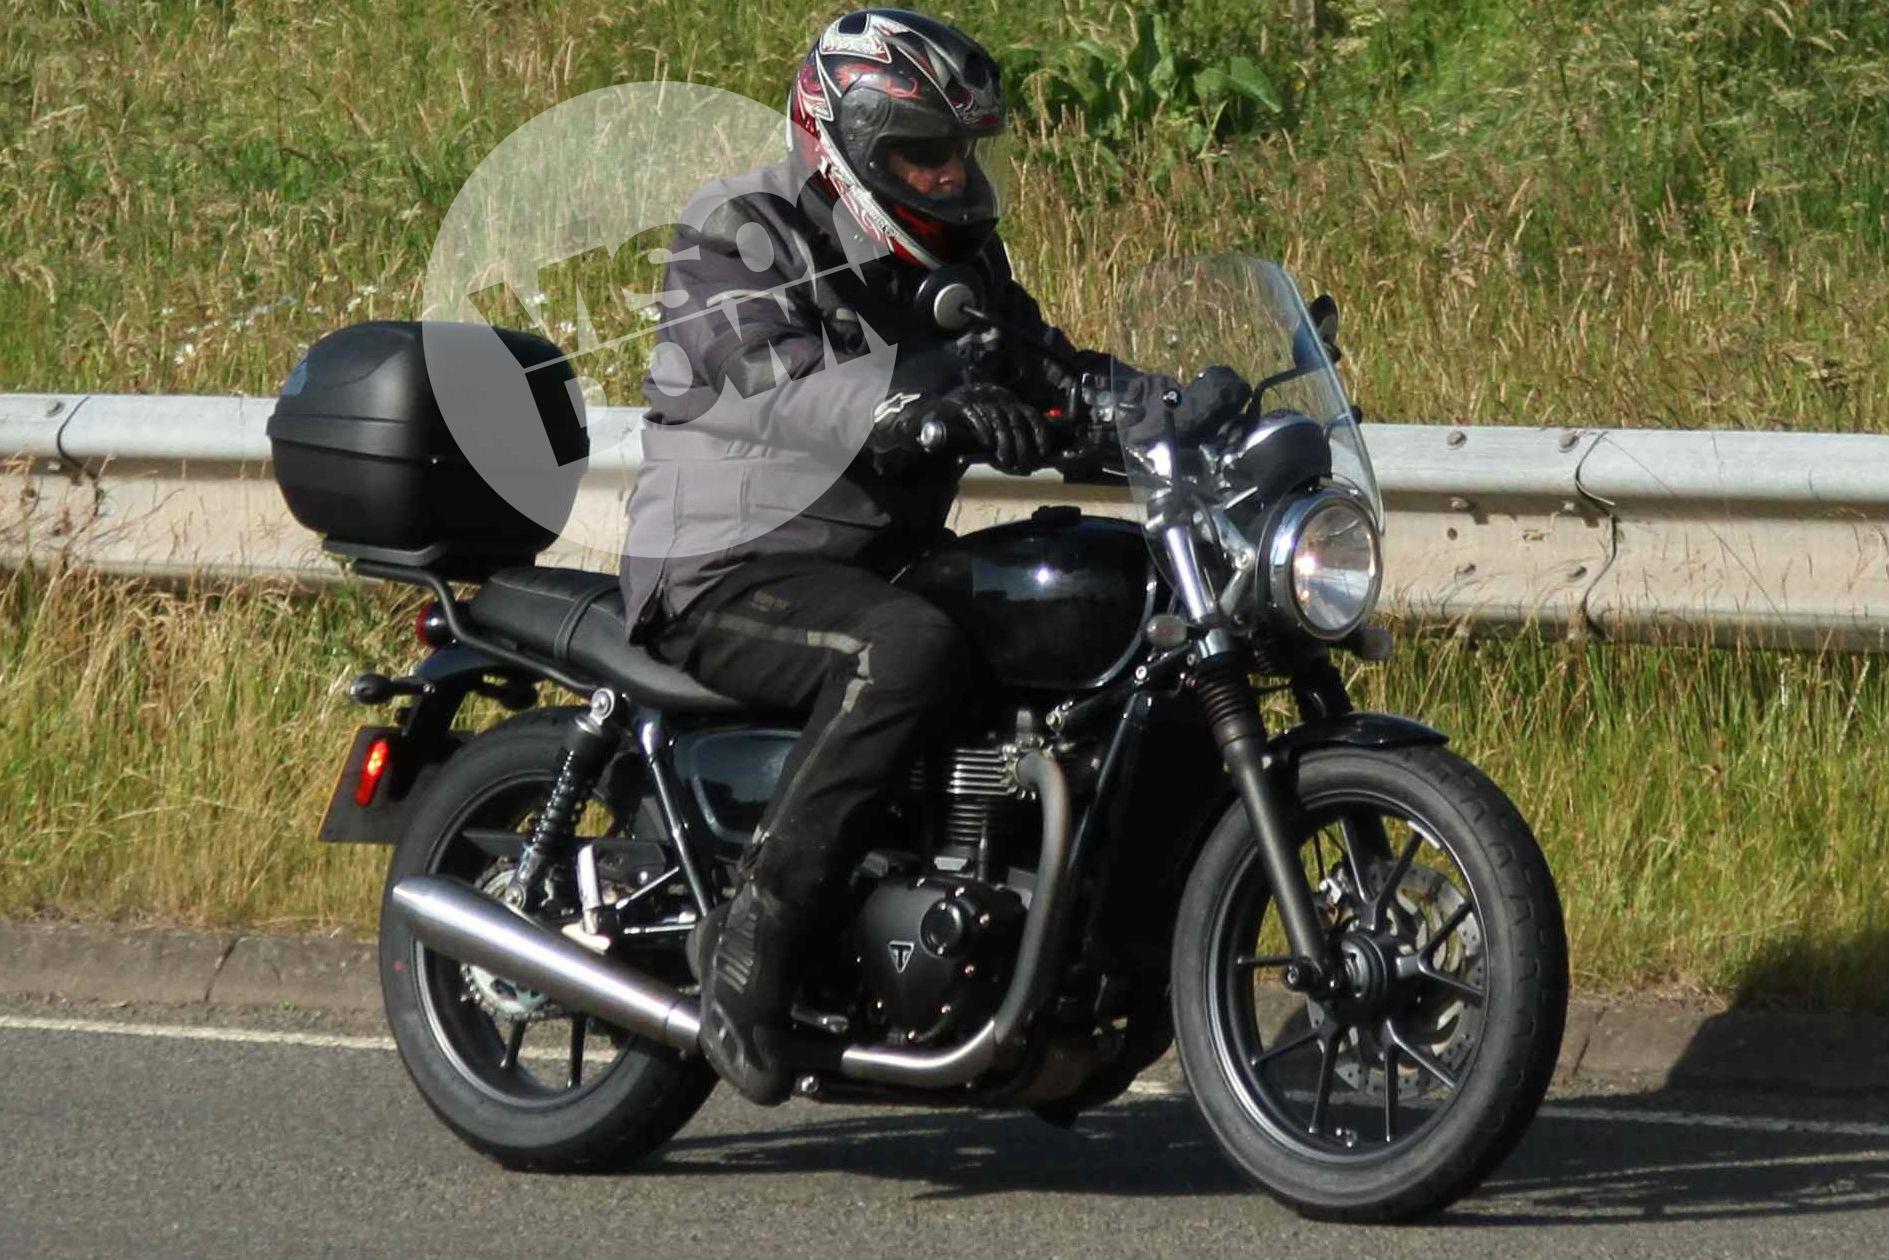 New Base Model Triumph Bonneville Caught Visordown